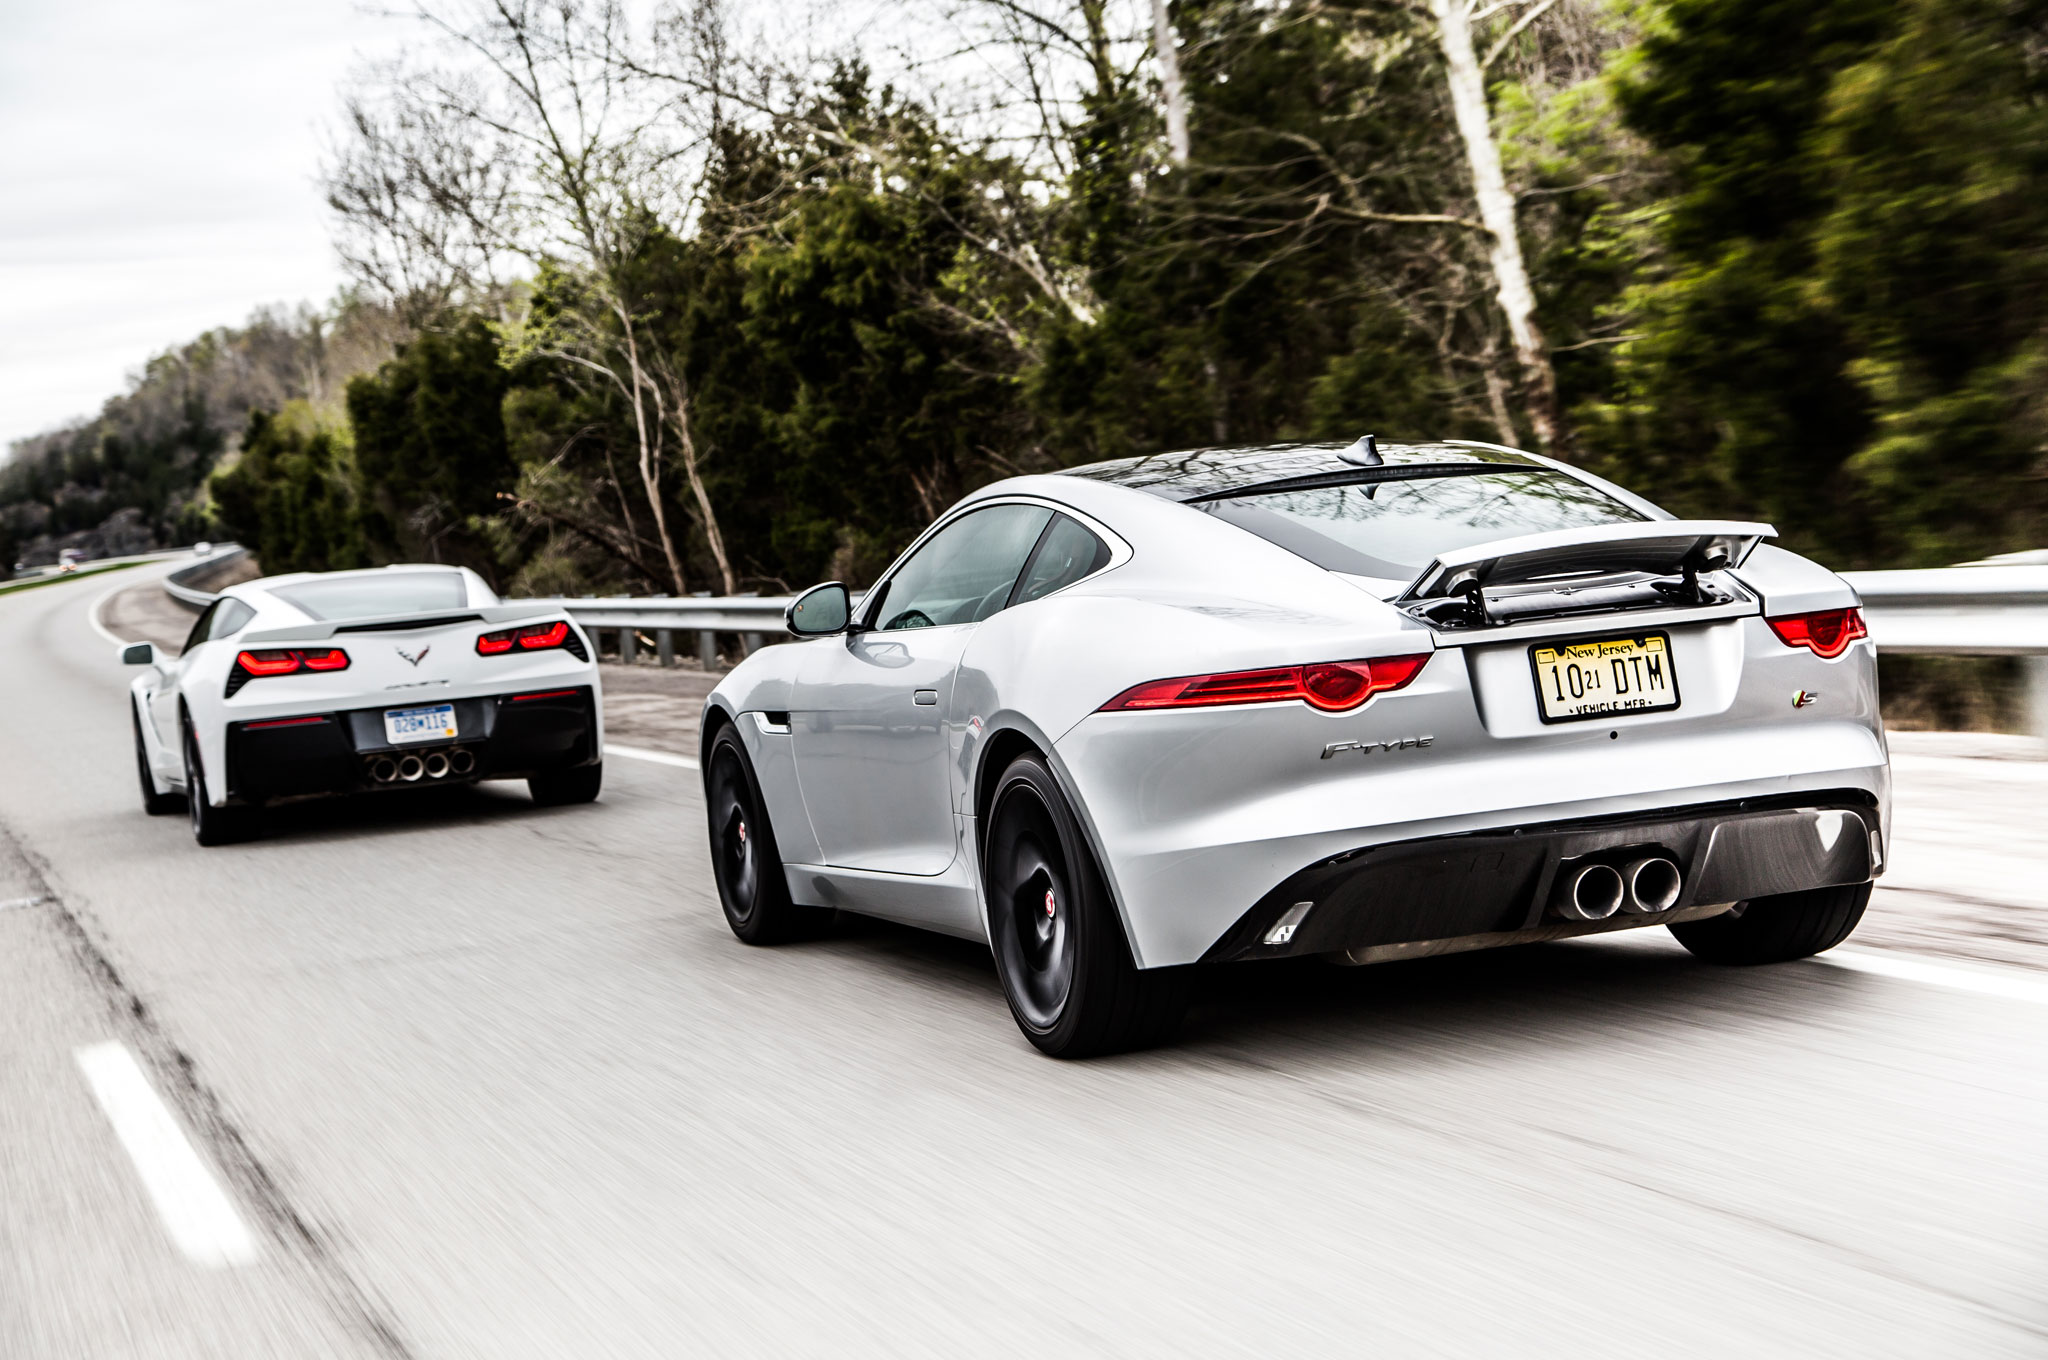 Jaguar FType And Chevrolet Corvette Head To Kentucky - 2015 jaguar f type s